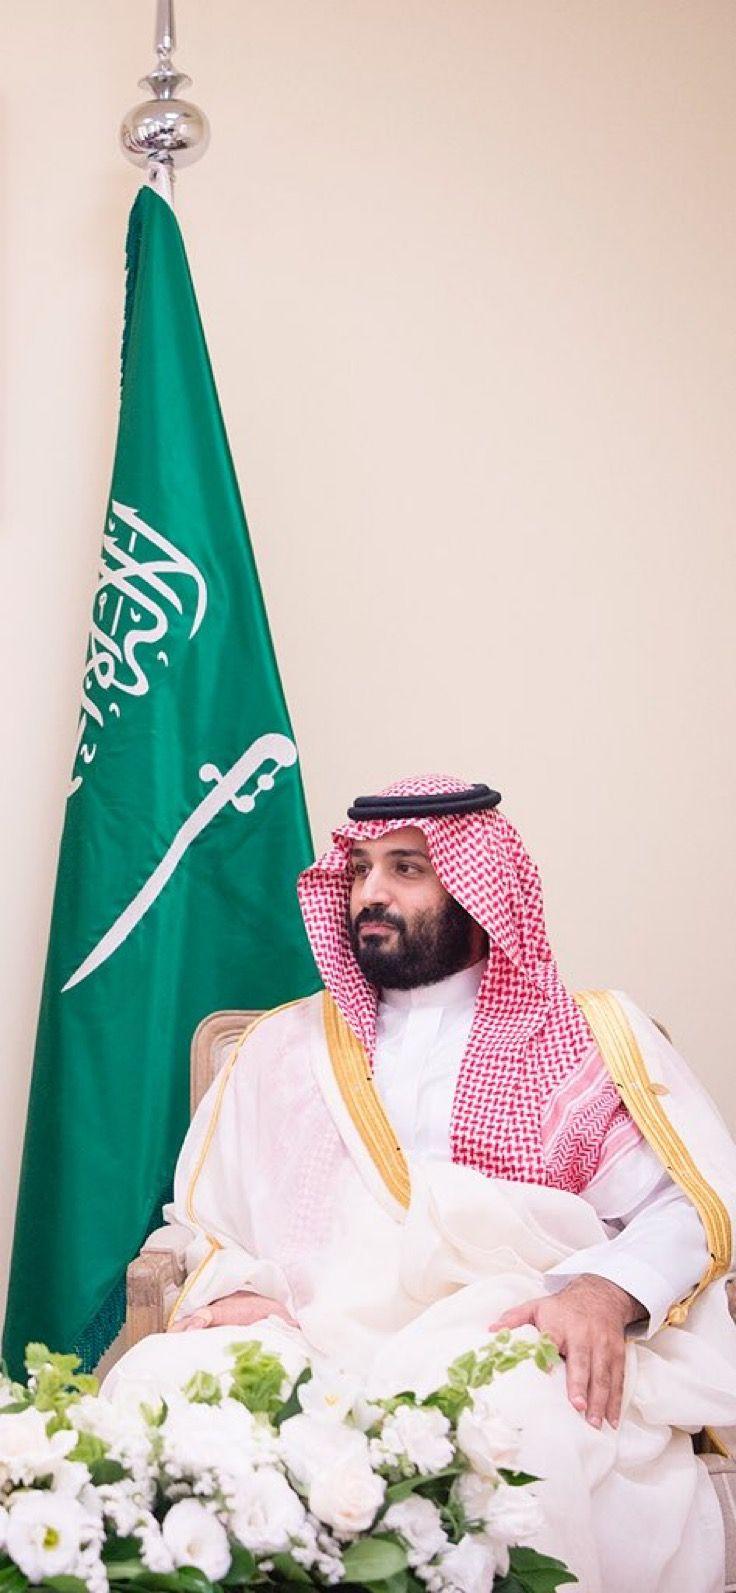 سيدي محمد بن سلمان حفظه الله King Salman Saudi Arabia National Day Saudi Ksa Saudi Arabia